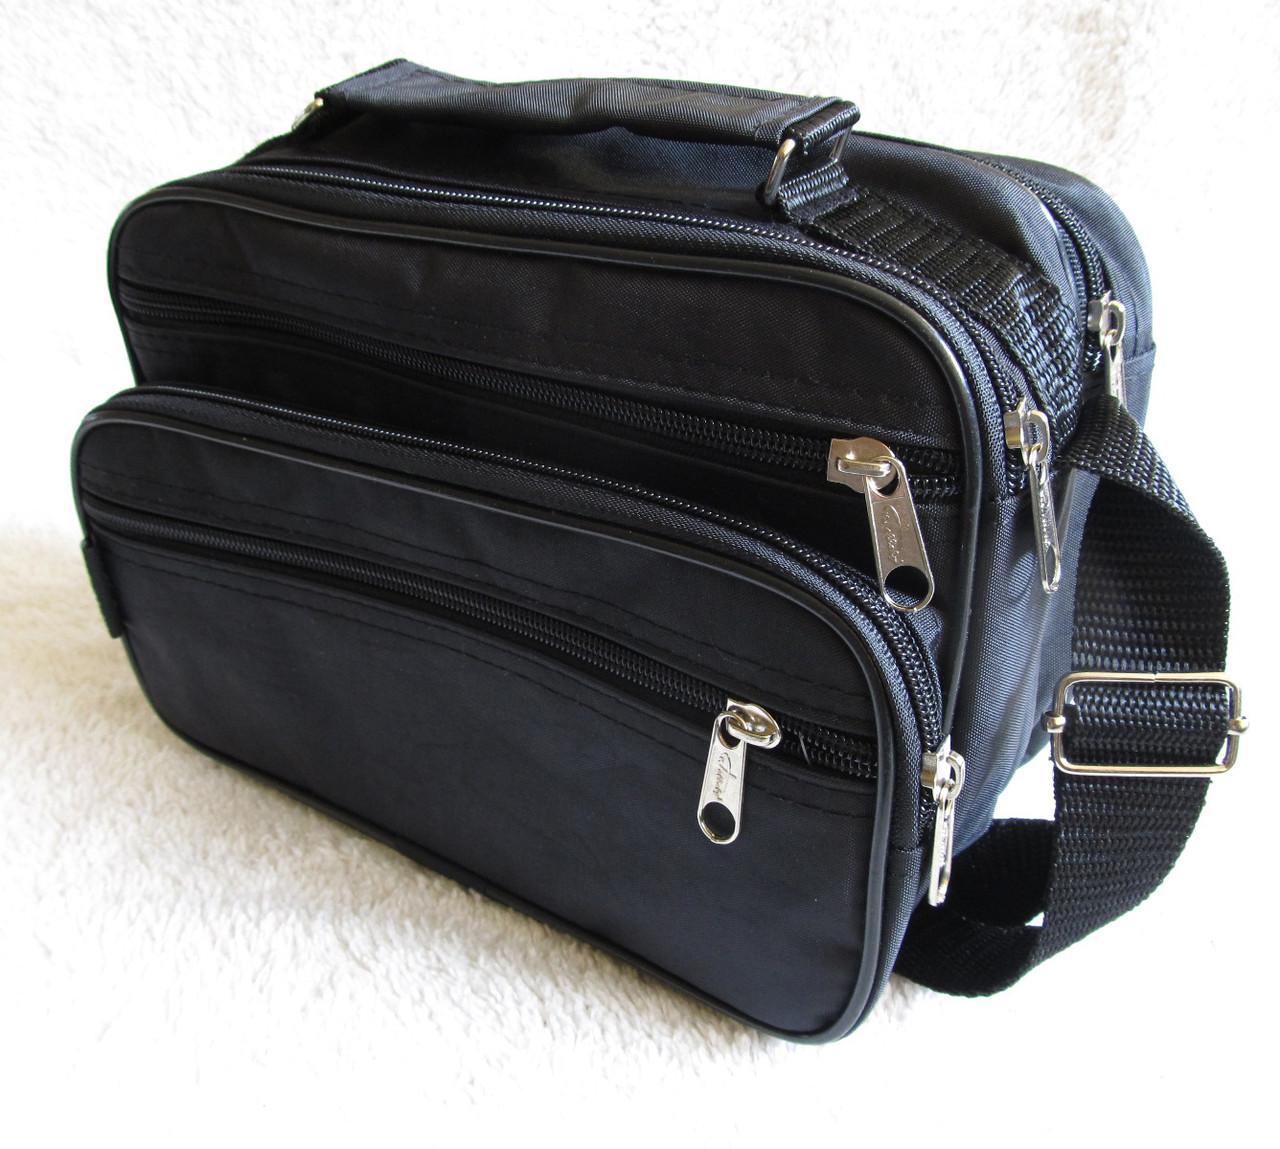 6c93bd5376fd Мужская сумка Wallaby 2123 черная барсетка через плечо 24х16х13см -  Интернет-магазин